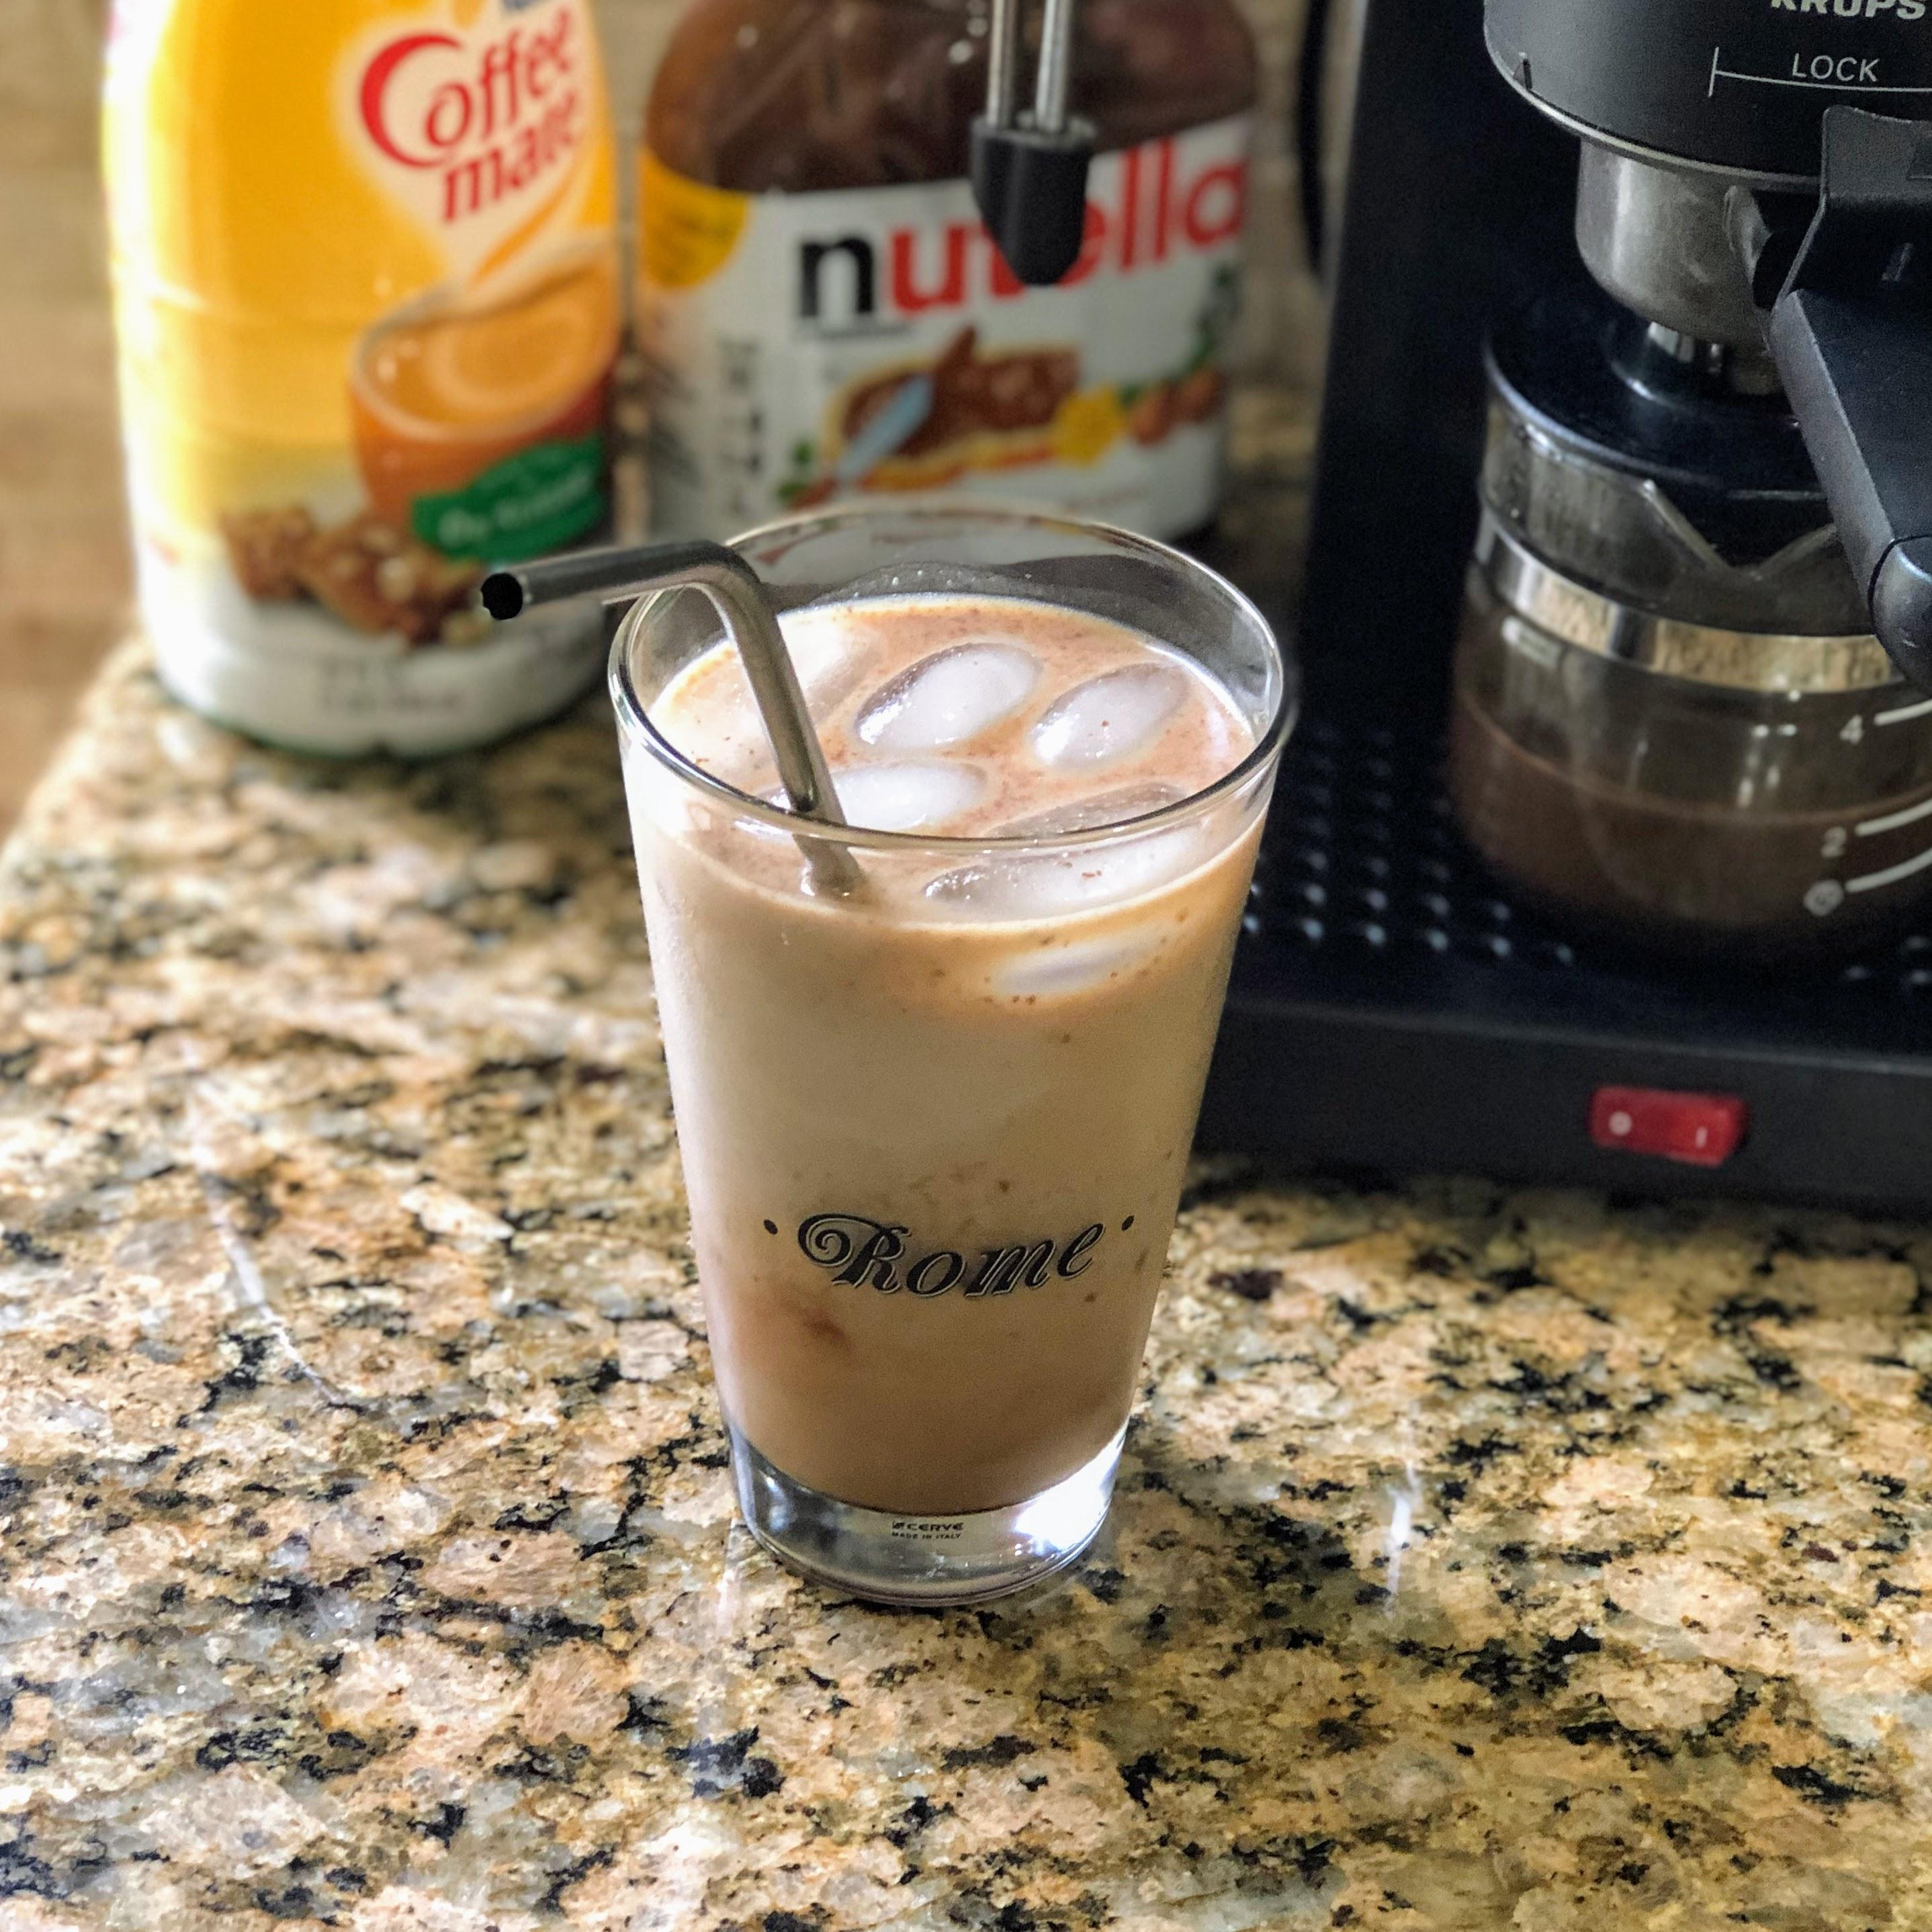 Iced Almond Milk Nutella® Latte